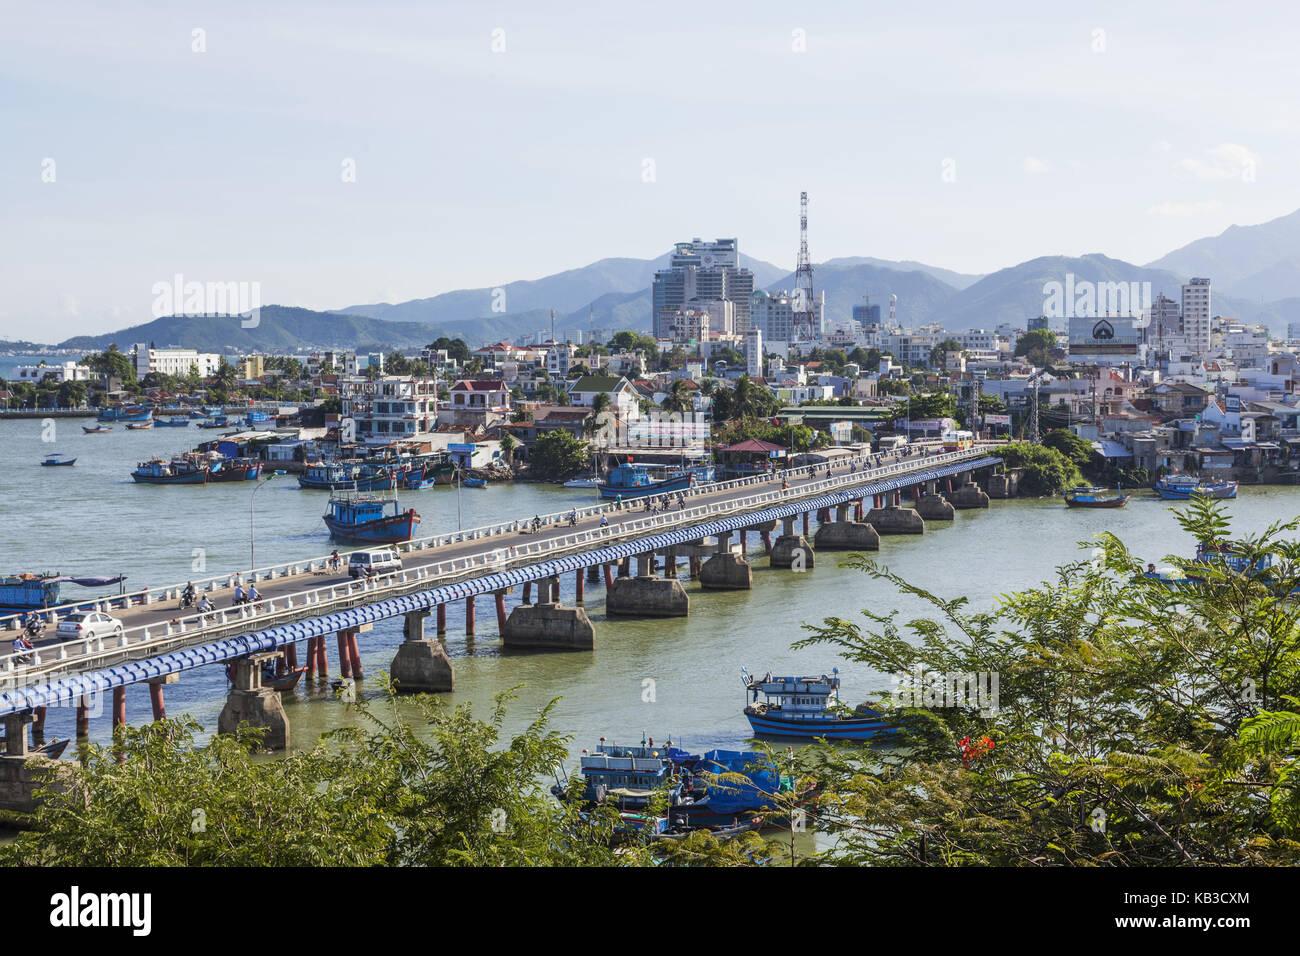 Vietnam, Nha Trang, townscape, - Stock Image